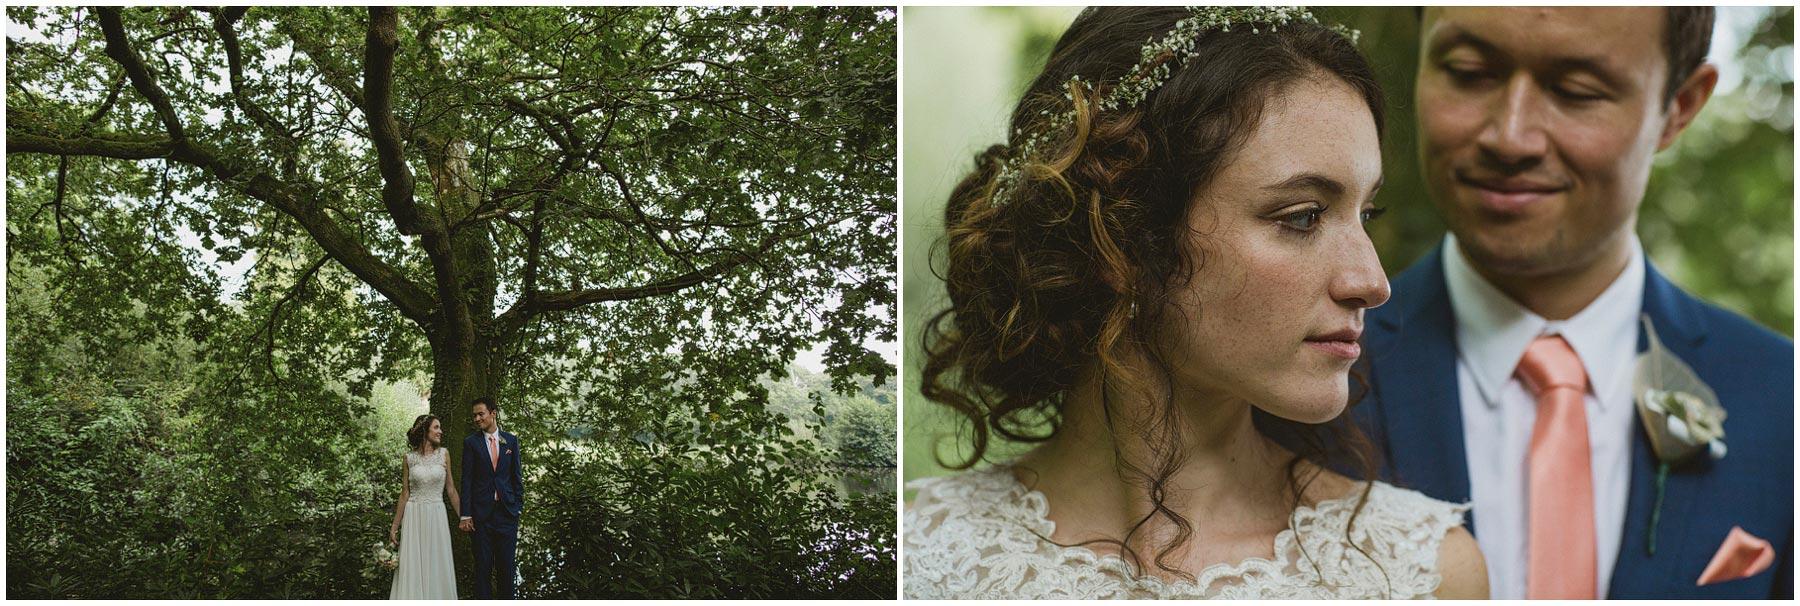 Colehayes-Park-Wedding-Photography_0141